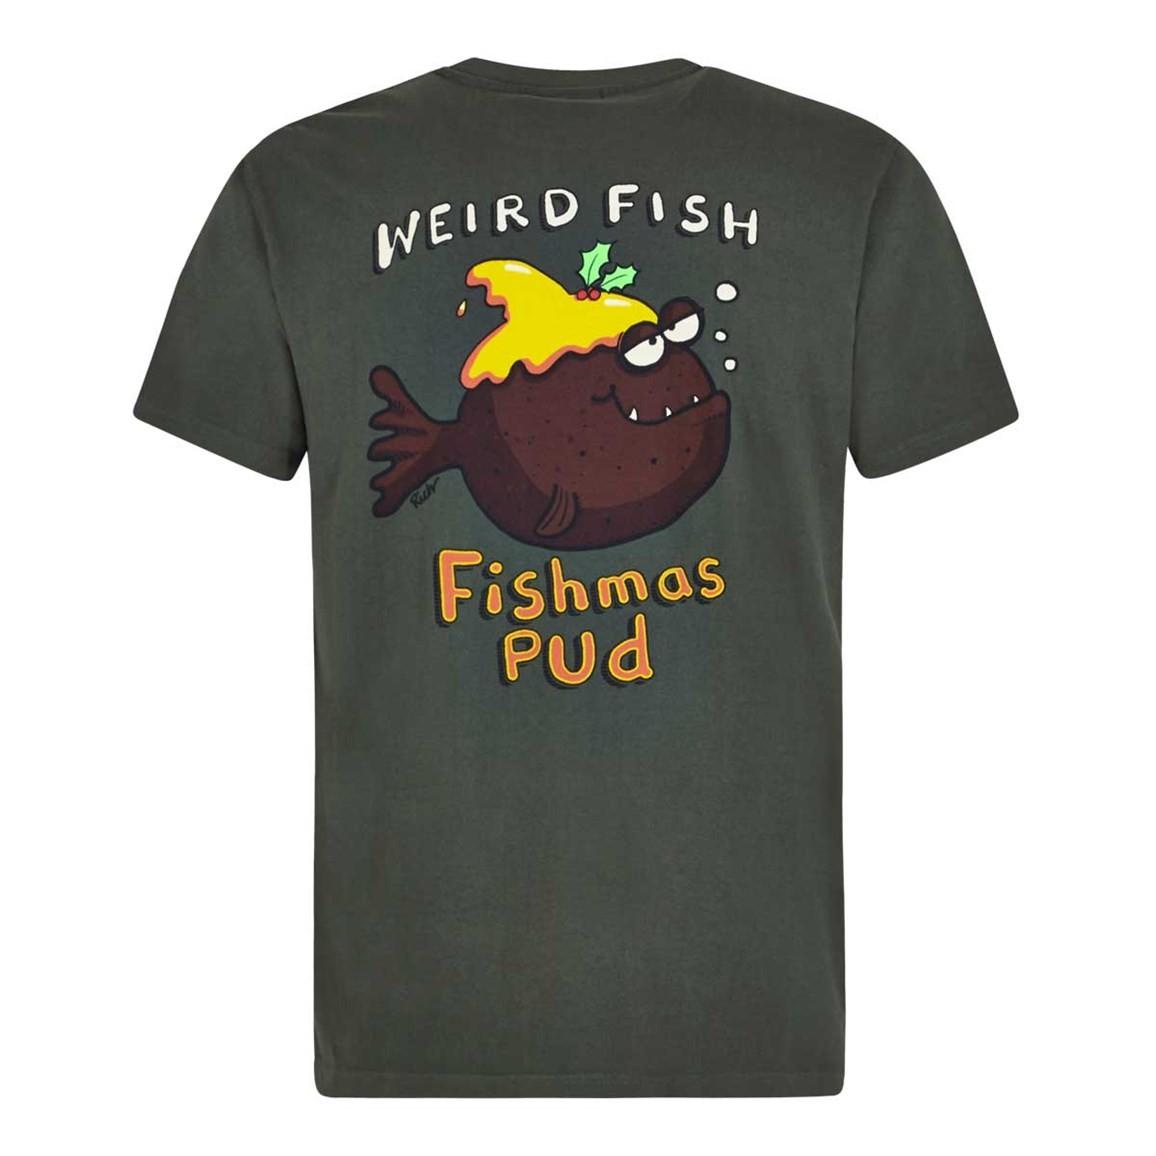 Weird Fish Fishmas Pud Artist T-Shirt Thyme